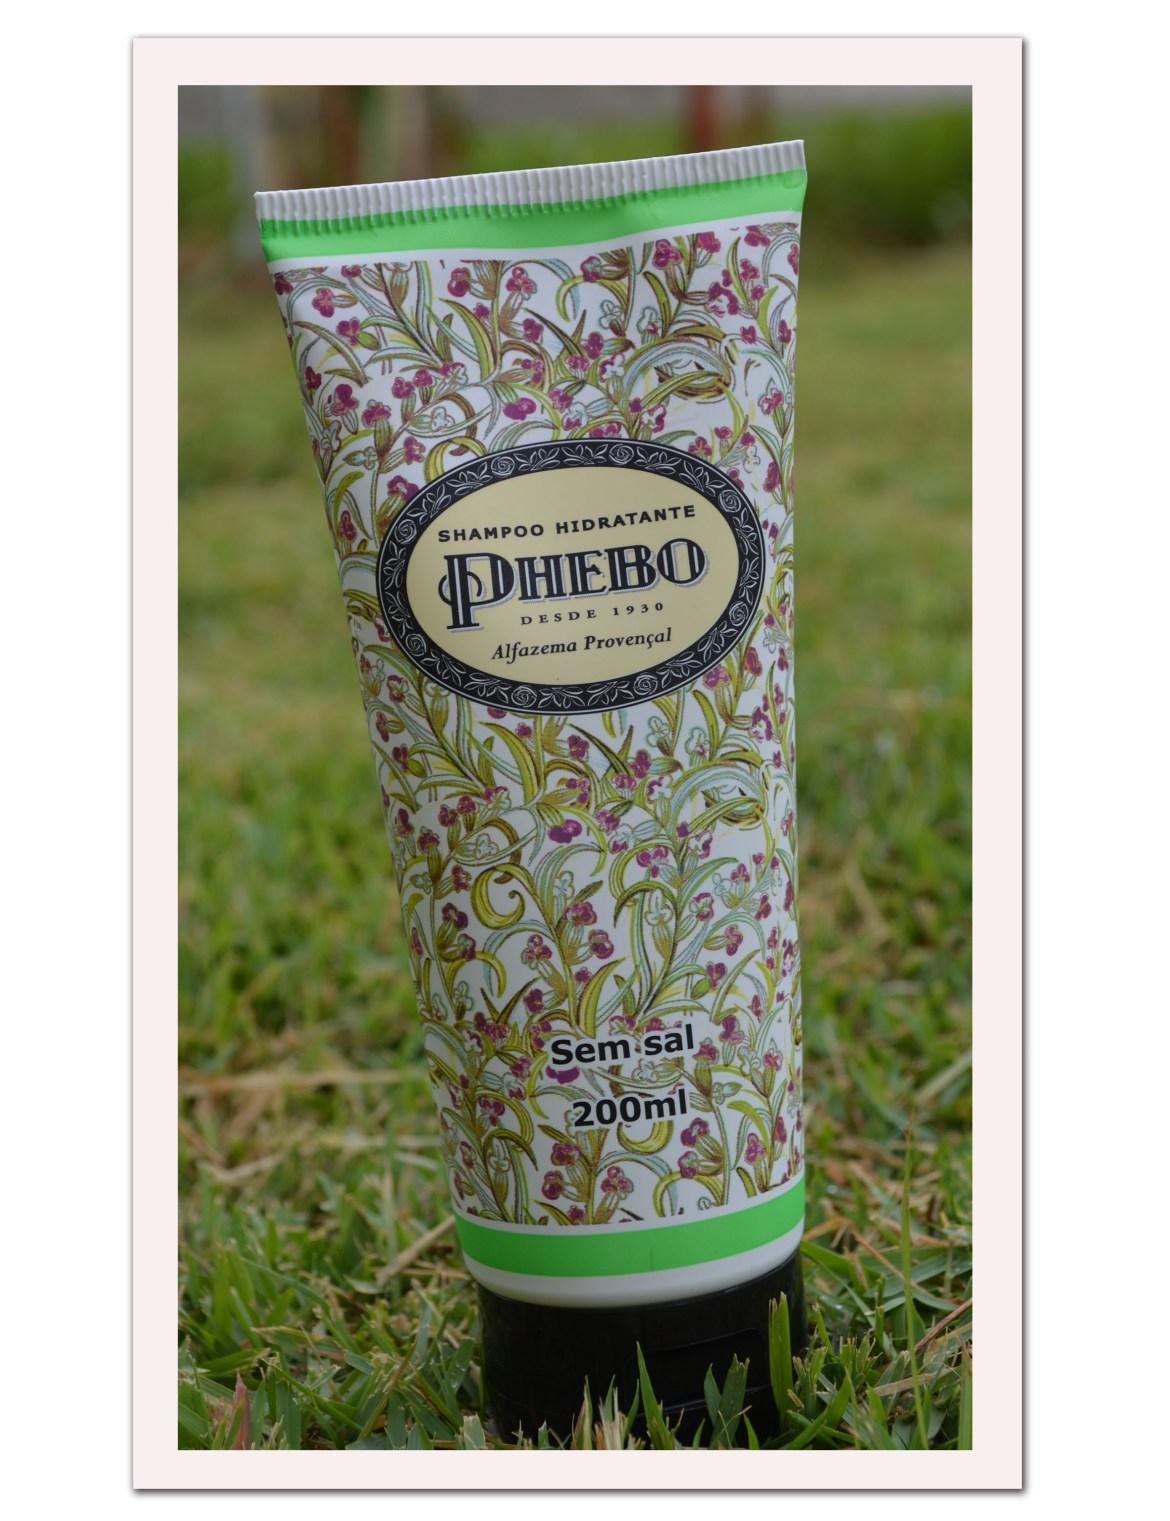 Shampoo Hidratante Alfazema Provençal – Phebo